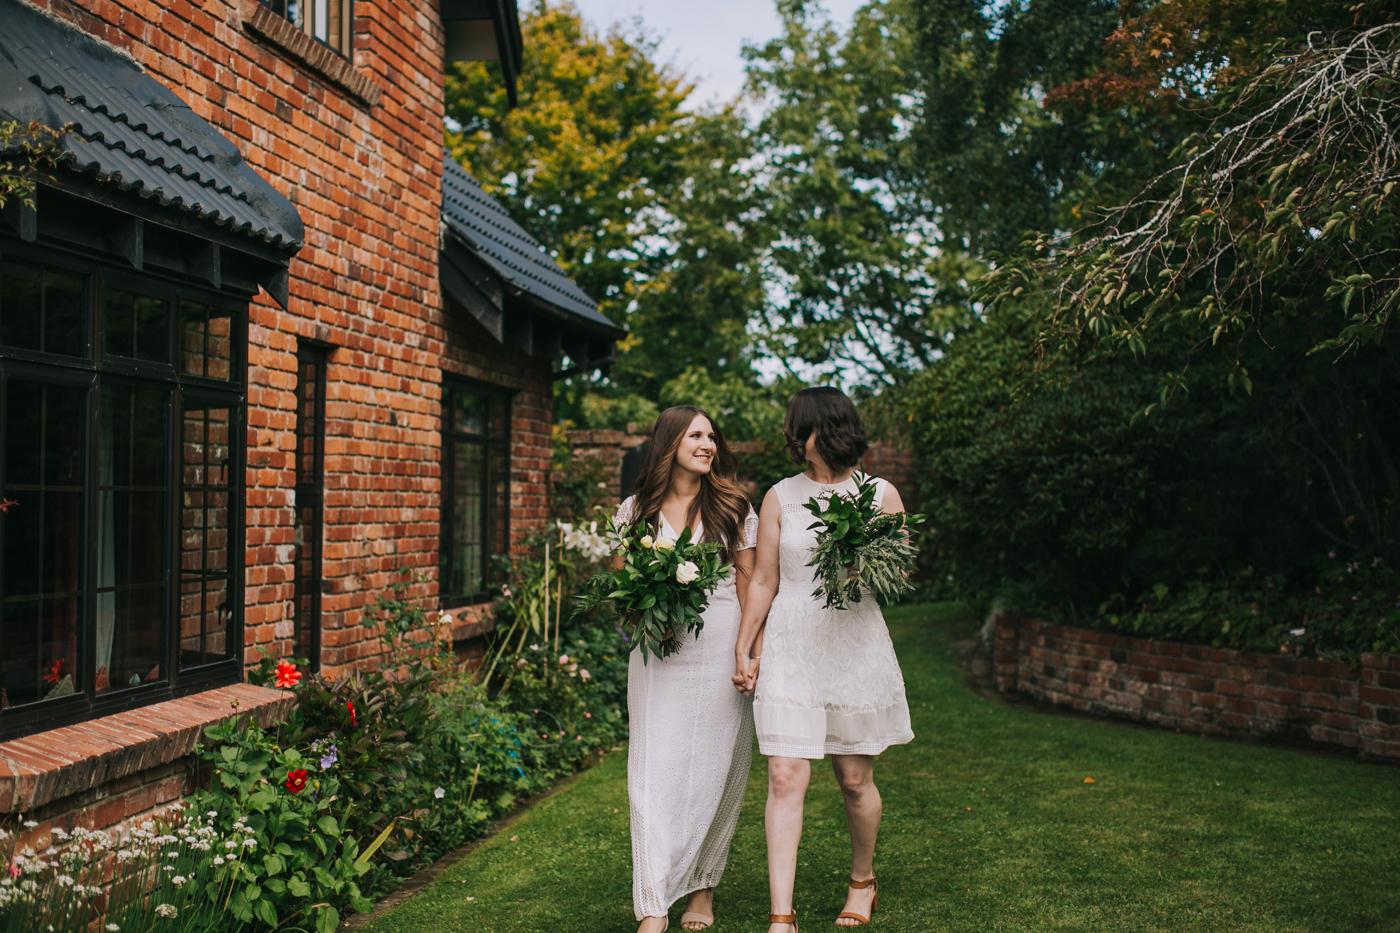 Ariana & Tim - Dunedin, New Zealand Wedding - Destination Wedding - Samantha Heather Photography-81.jpg